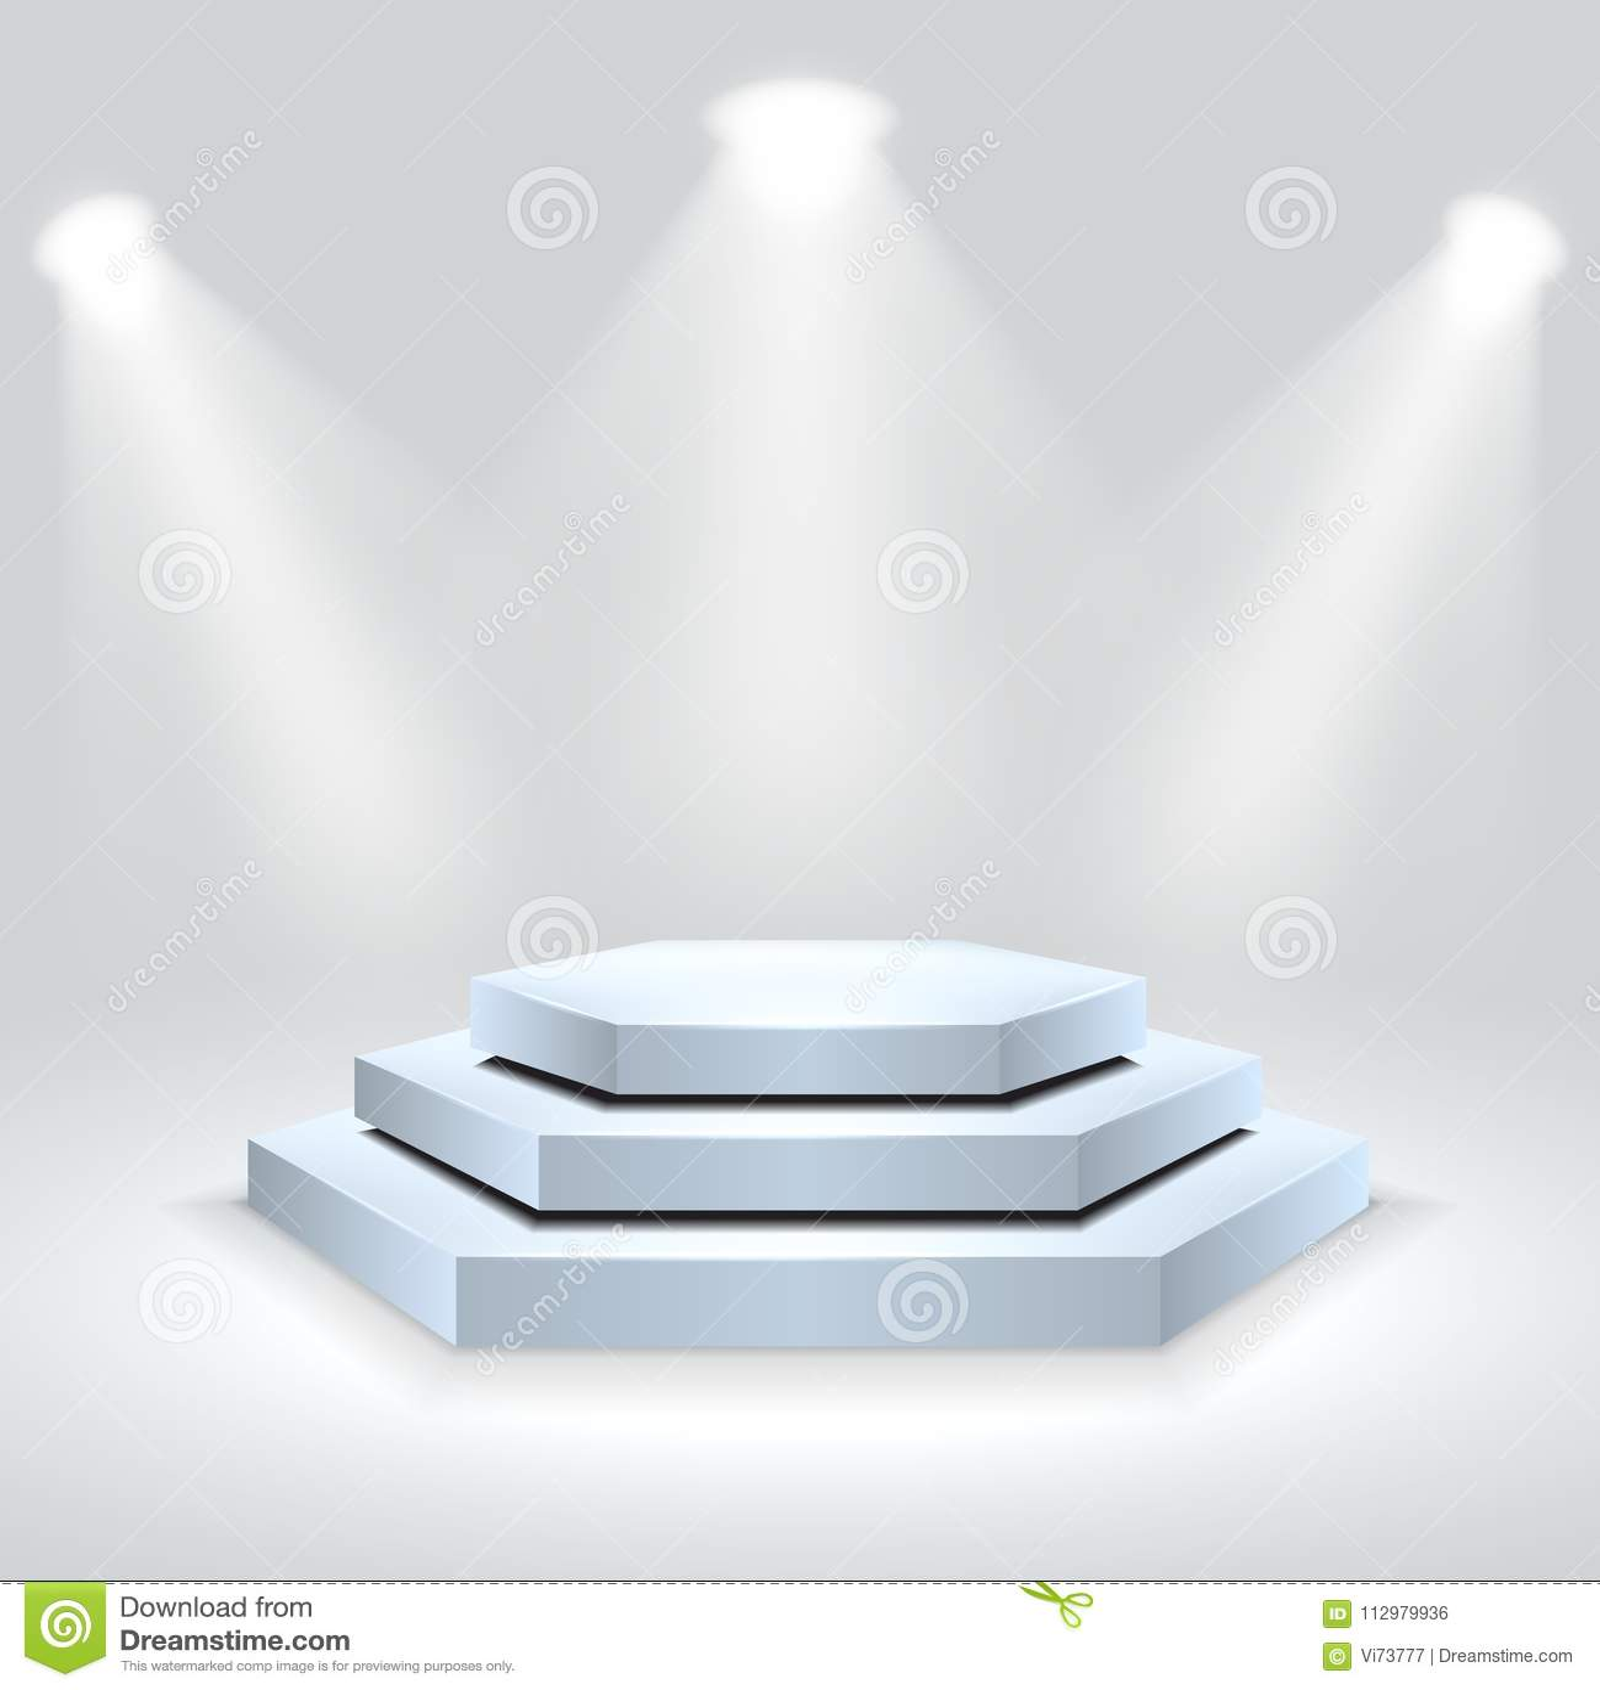 Hexagon podium illuminated by spotlights. Empty ceremony pedestal. Vector illustration.